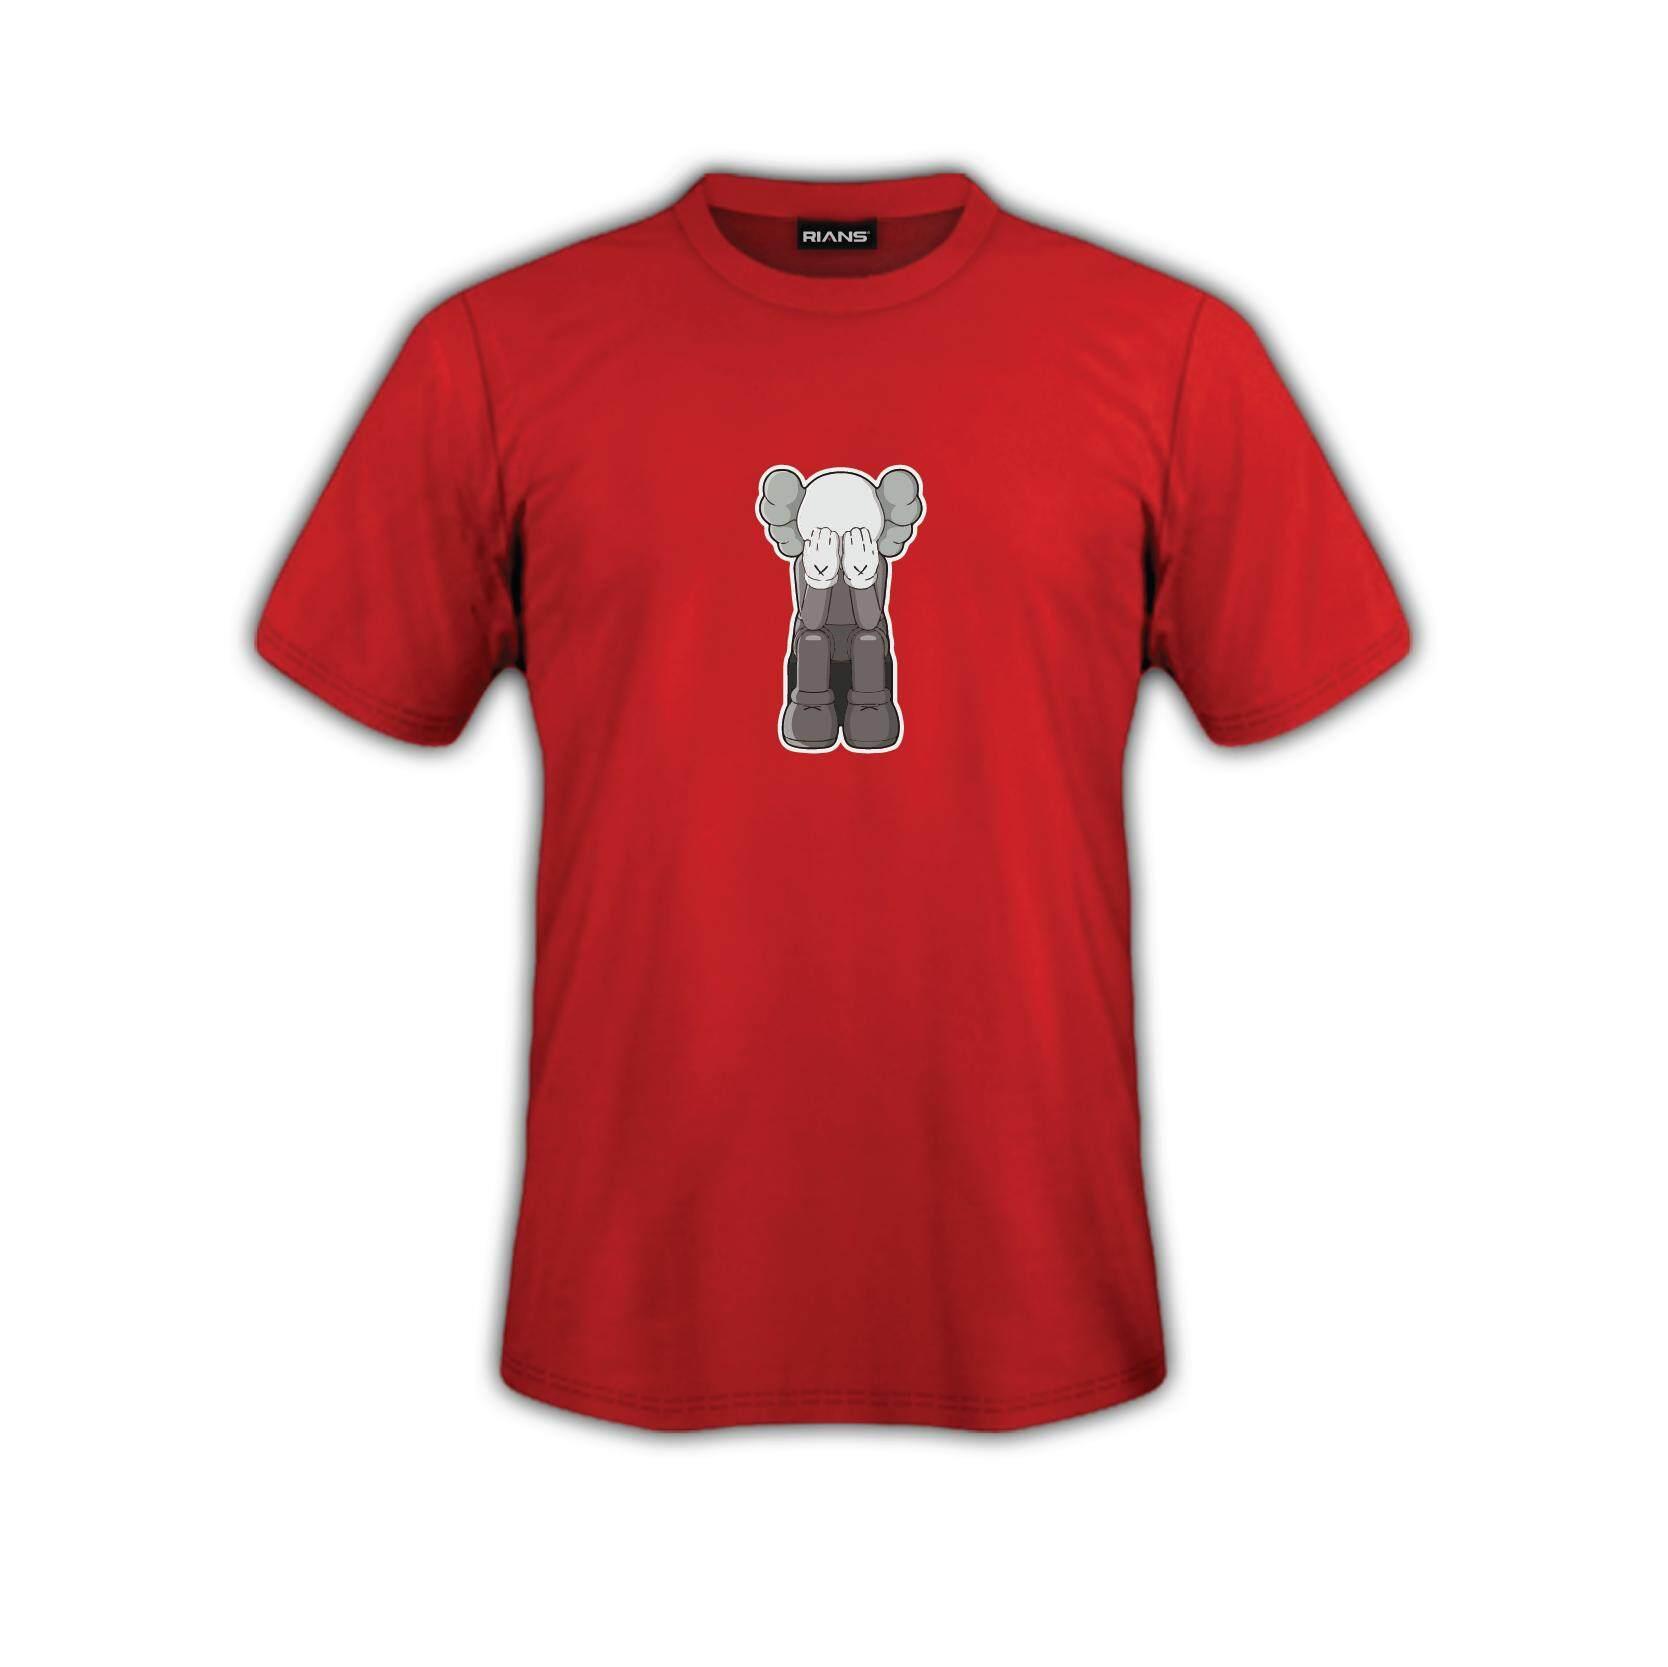 T-Shirt KAWS Tutup Mata Viral 4 Colour 100% Cotton Baju Tshirt Black White Hitam Putih Bossku